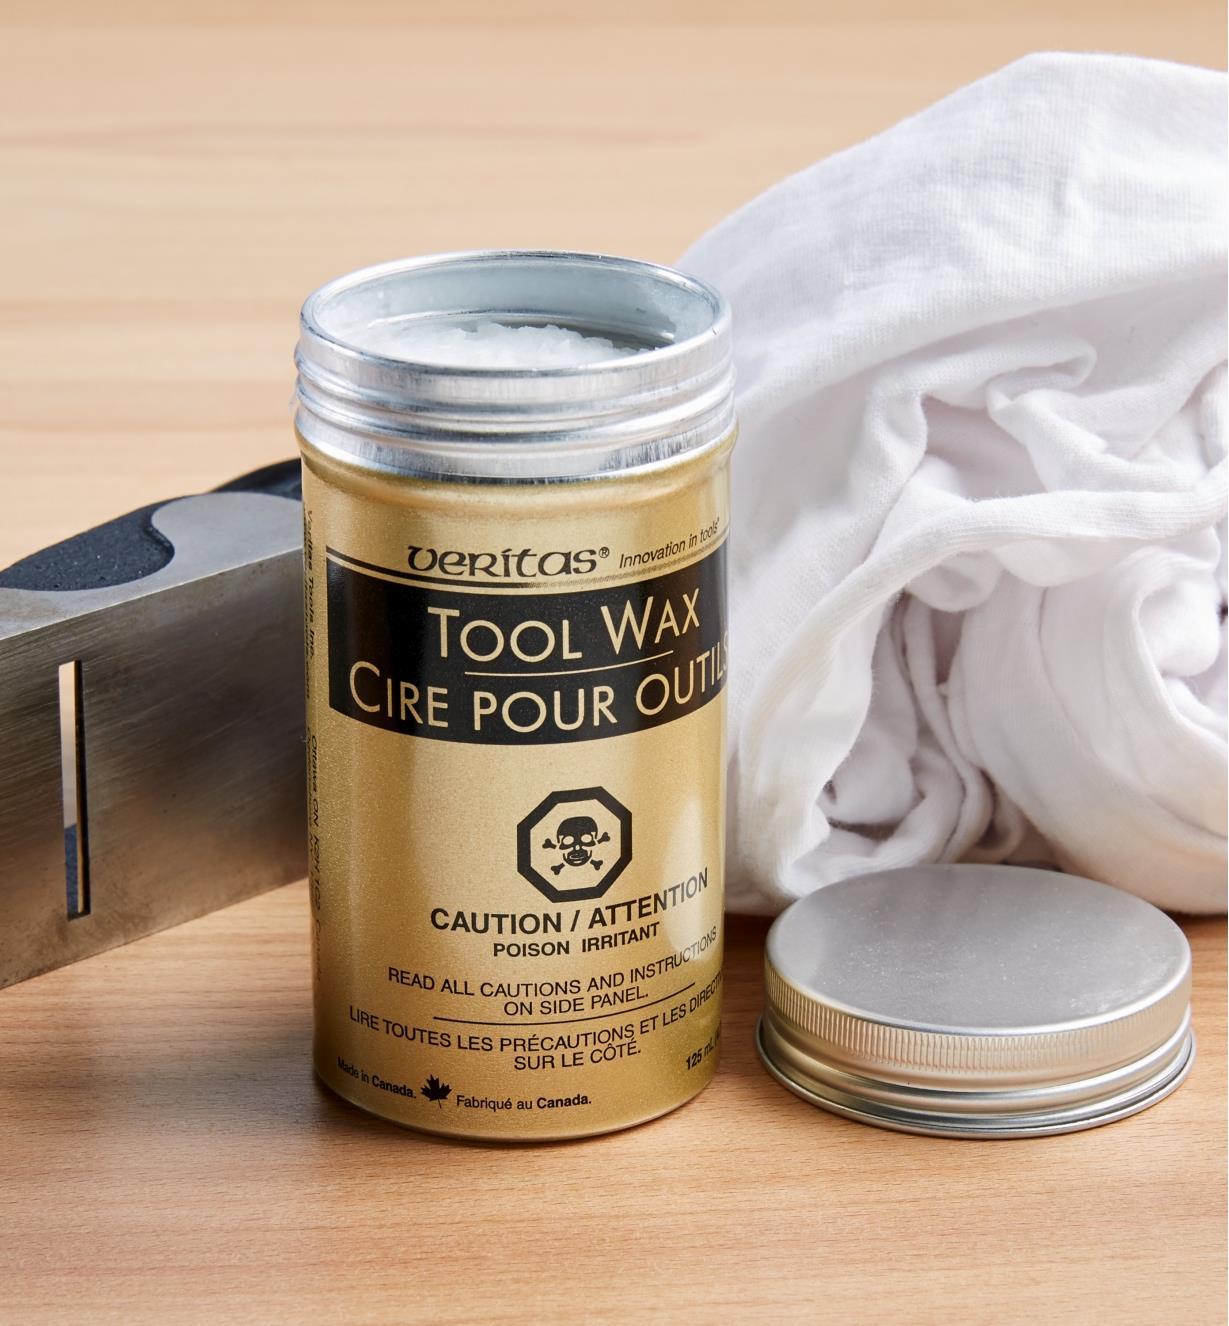 05Z1601 - Veritas Tool Wax